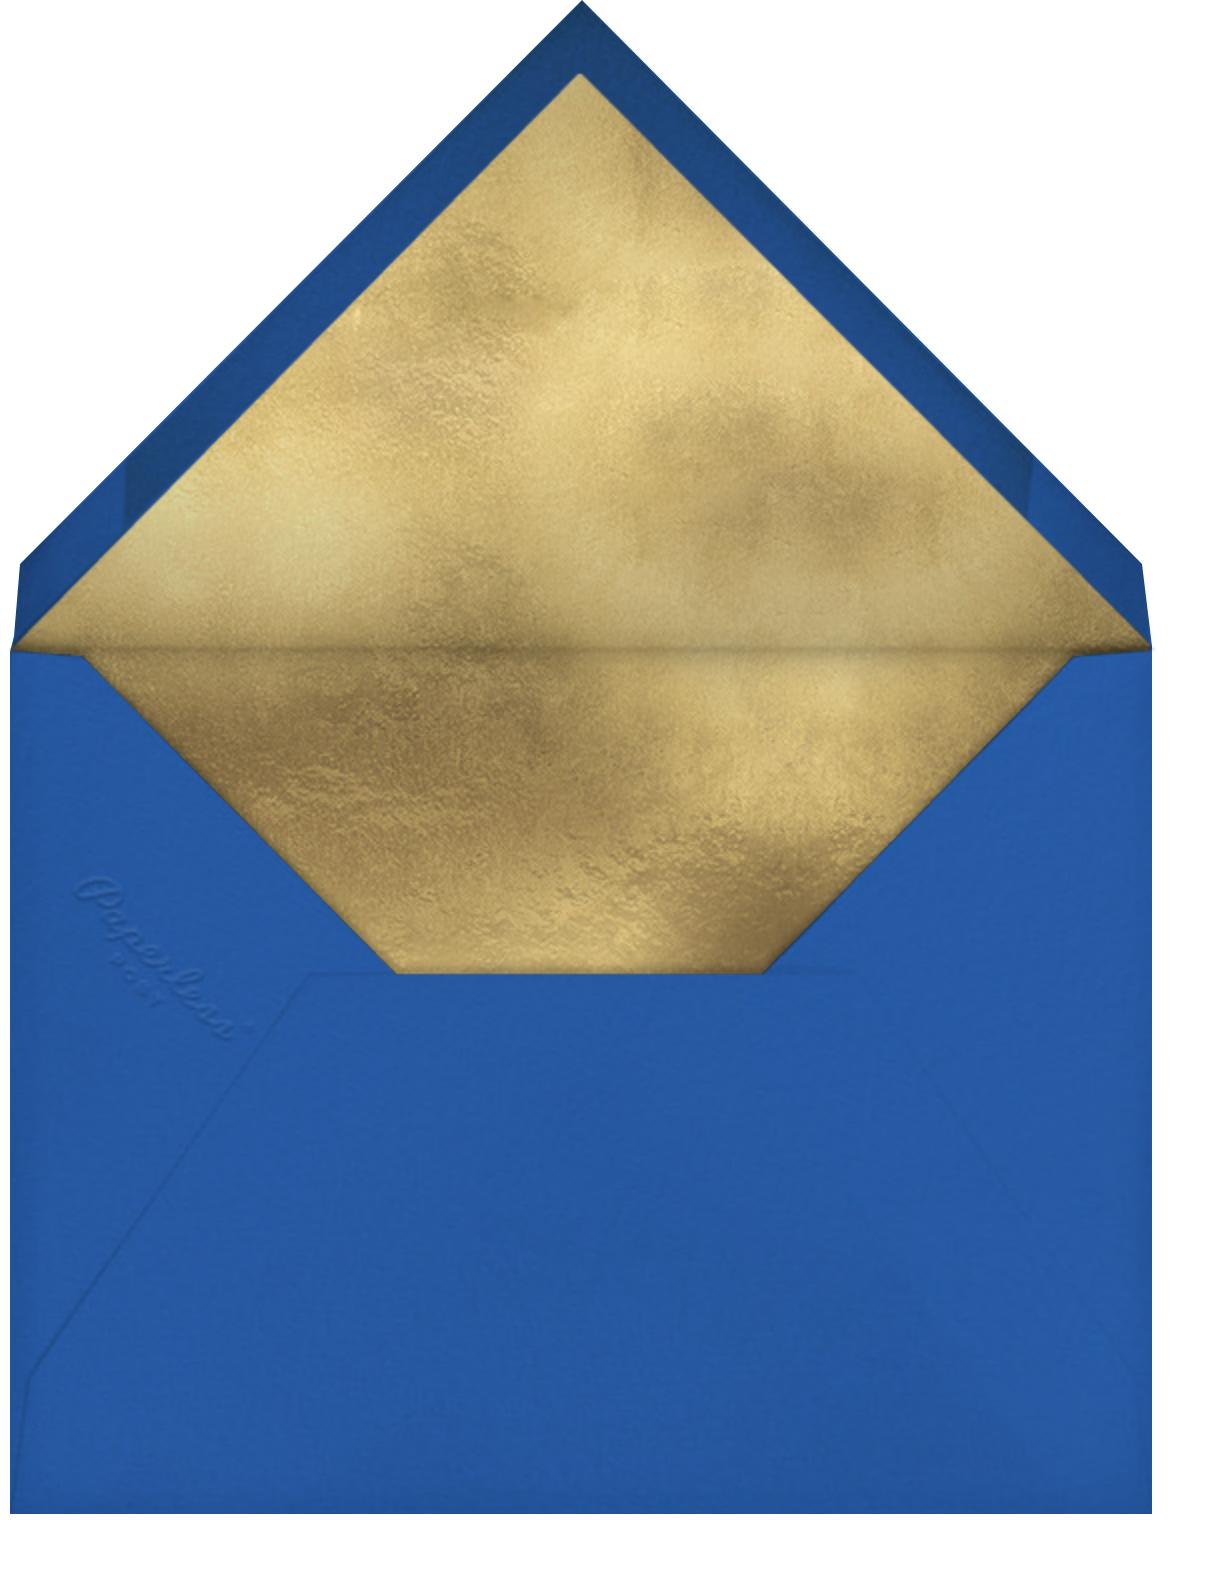 Super Dad - Rifle Paper Co. - Envelope